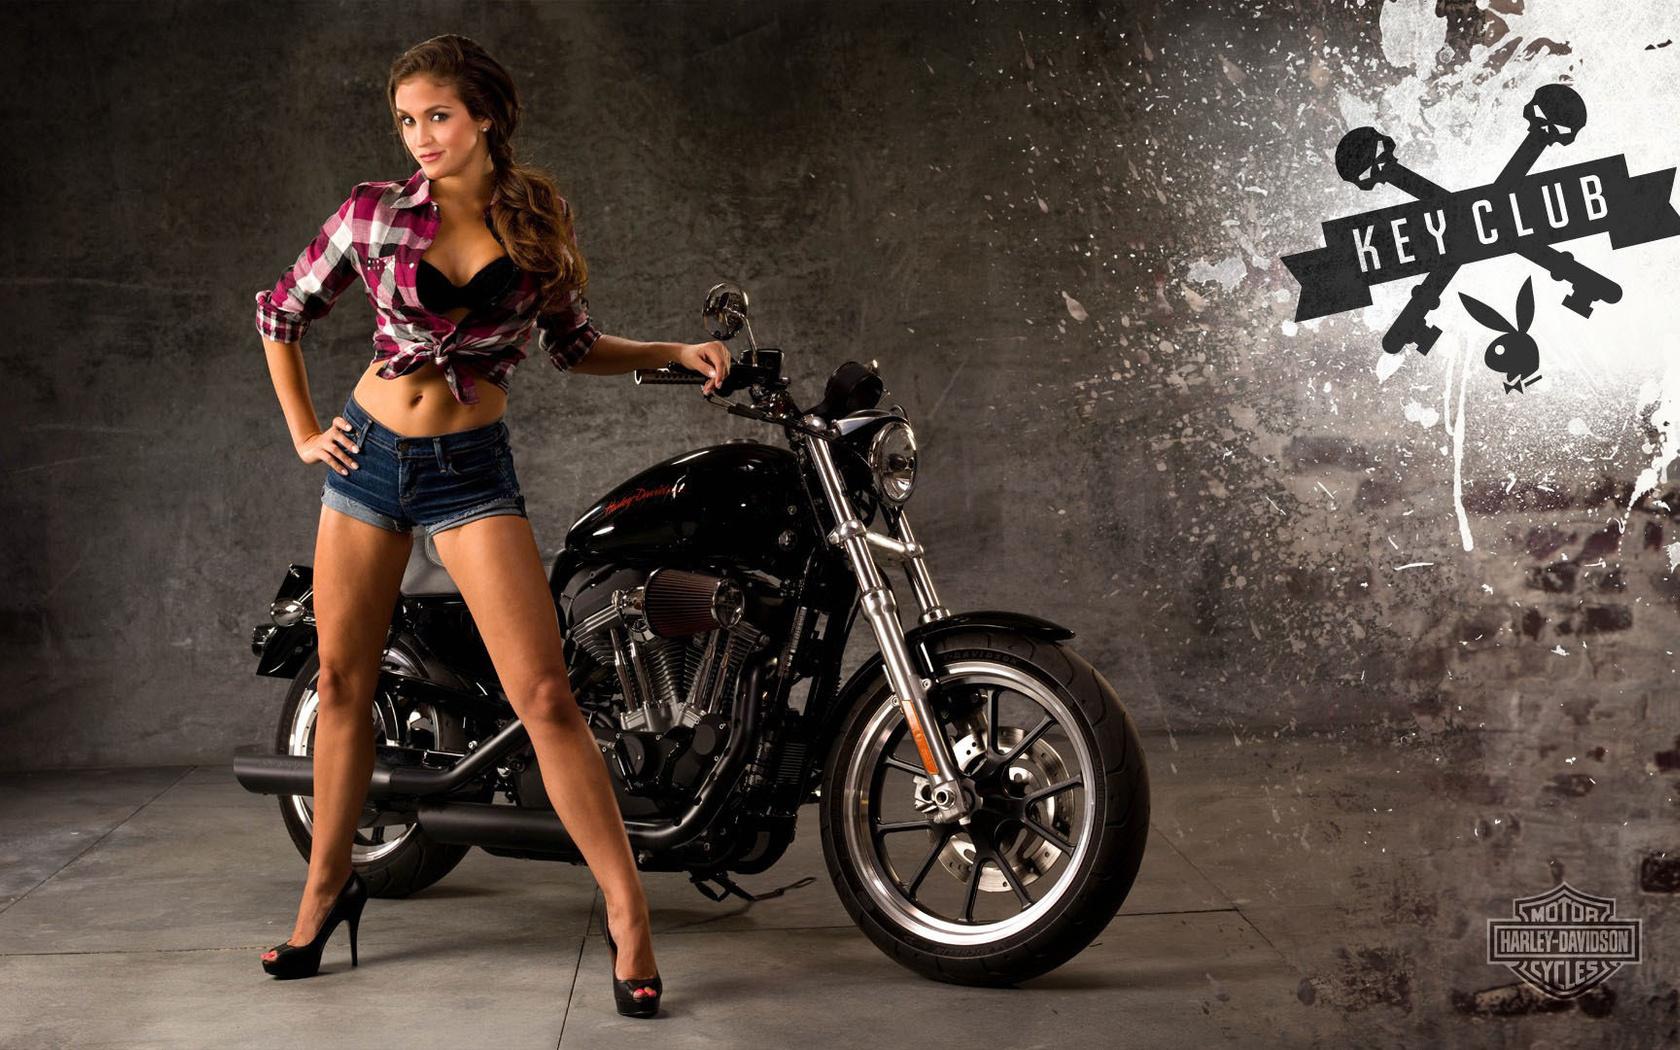 обои мотоцикл: